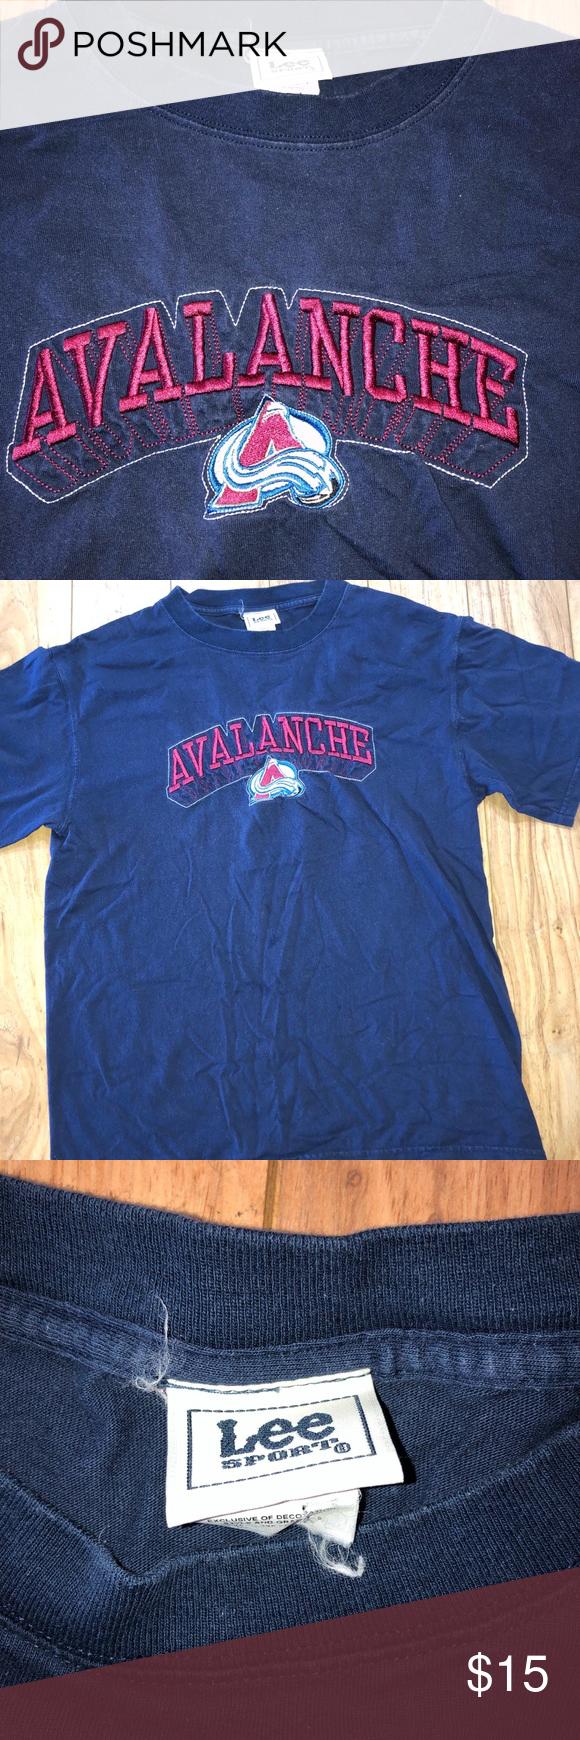 Colorado Avalanche Vintage T Shirt Men s Large NHL  🌎everythingvtg.bigcartel.com🌎 📱 bd860fee1